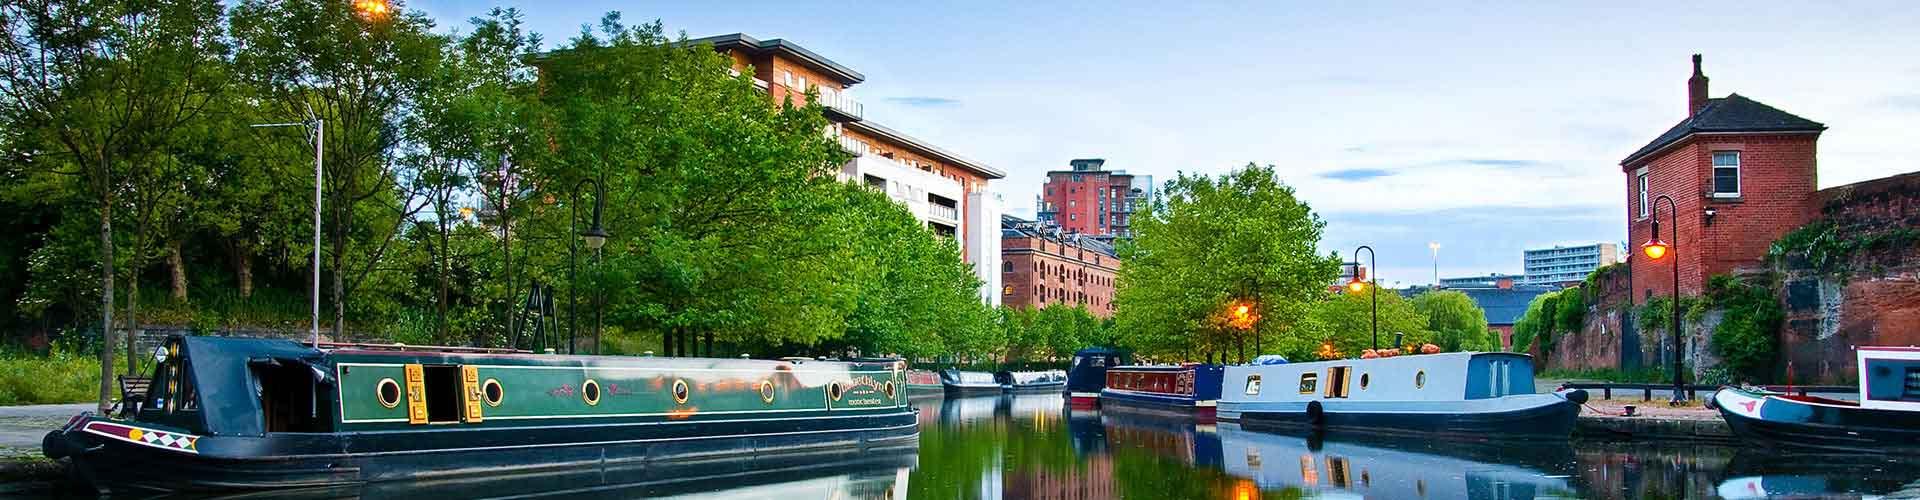 Manchester - Hoteles baratos en el distrito Crumpsall. Mapas de Manchester, Fotos y comentarios de cada Hotel barato en Manchester.